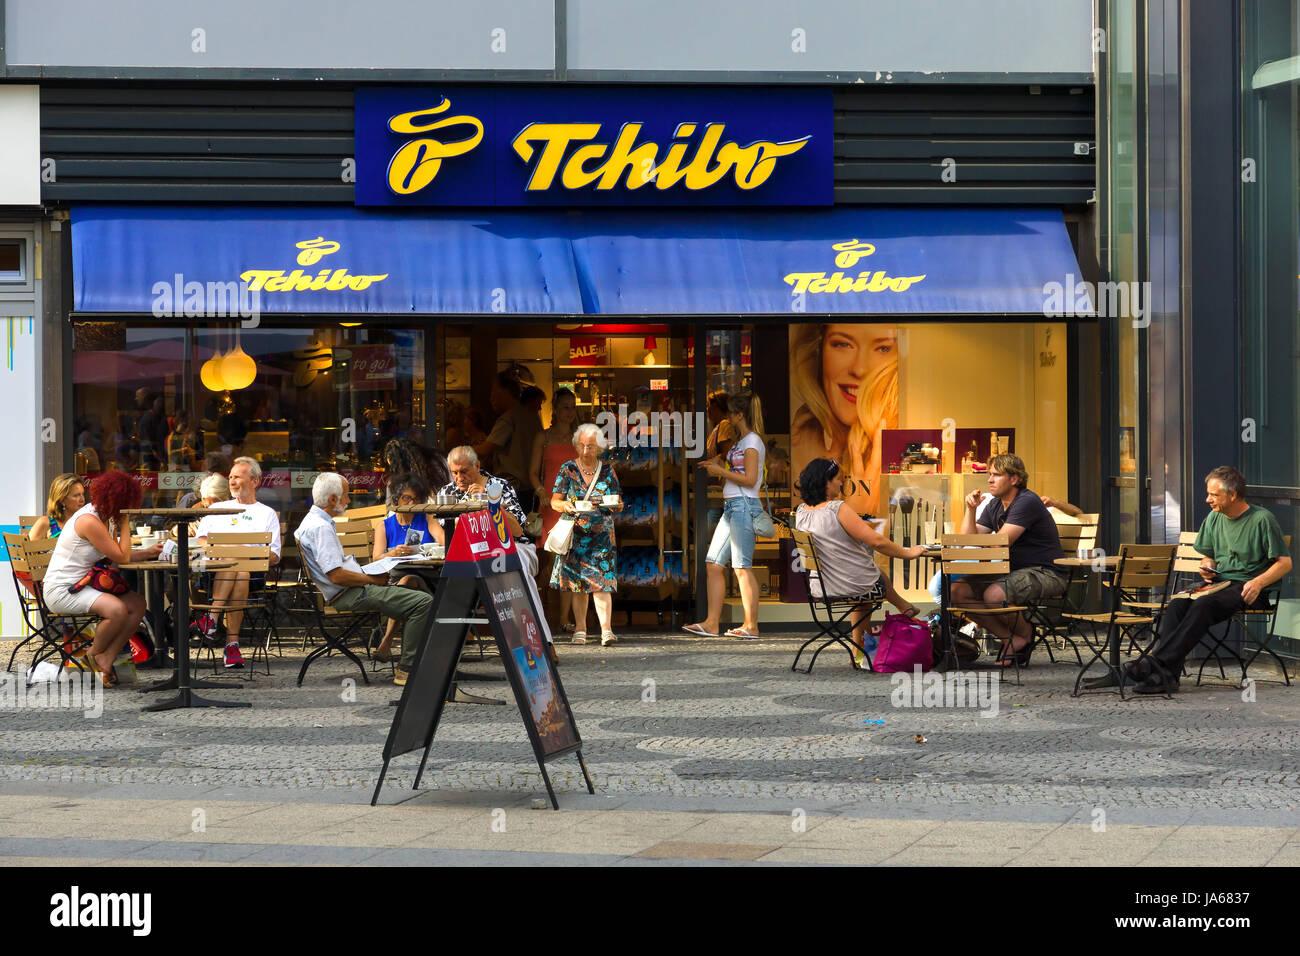 Berlin July 24 Shop Tschibo On Kurfuerstendamm Tchibo Is A